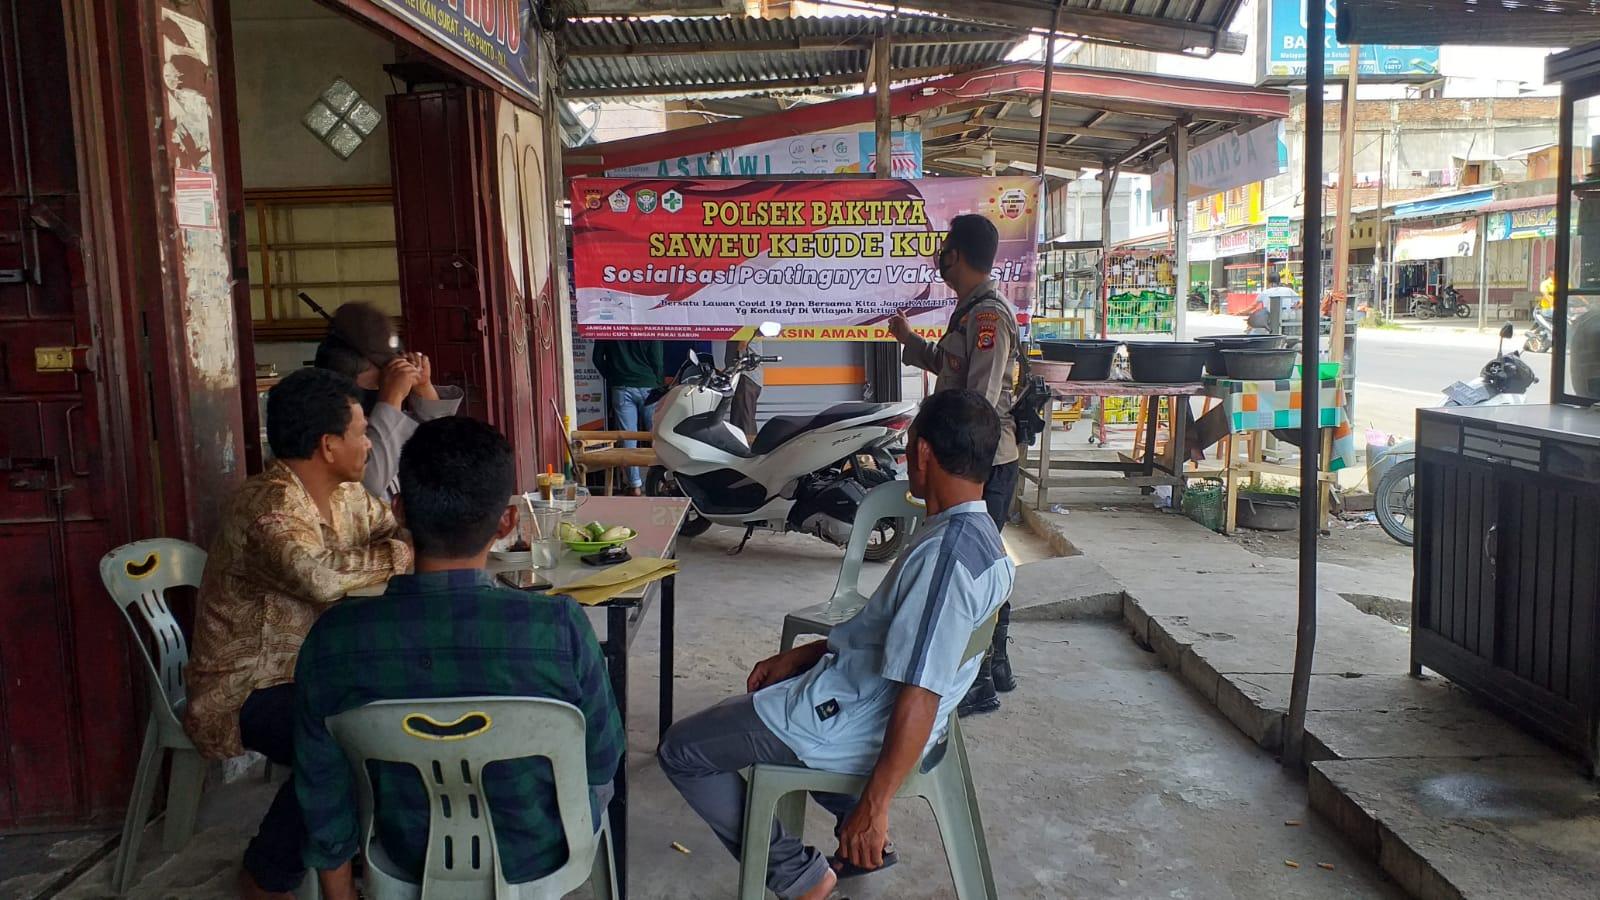 """Saweu Keude Kupi"" Jajaran Polsek Baktiya Polres Aceh Utara Terapkan Sosialisasi Vaksinasi Di kedai-kedai Kopi"